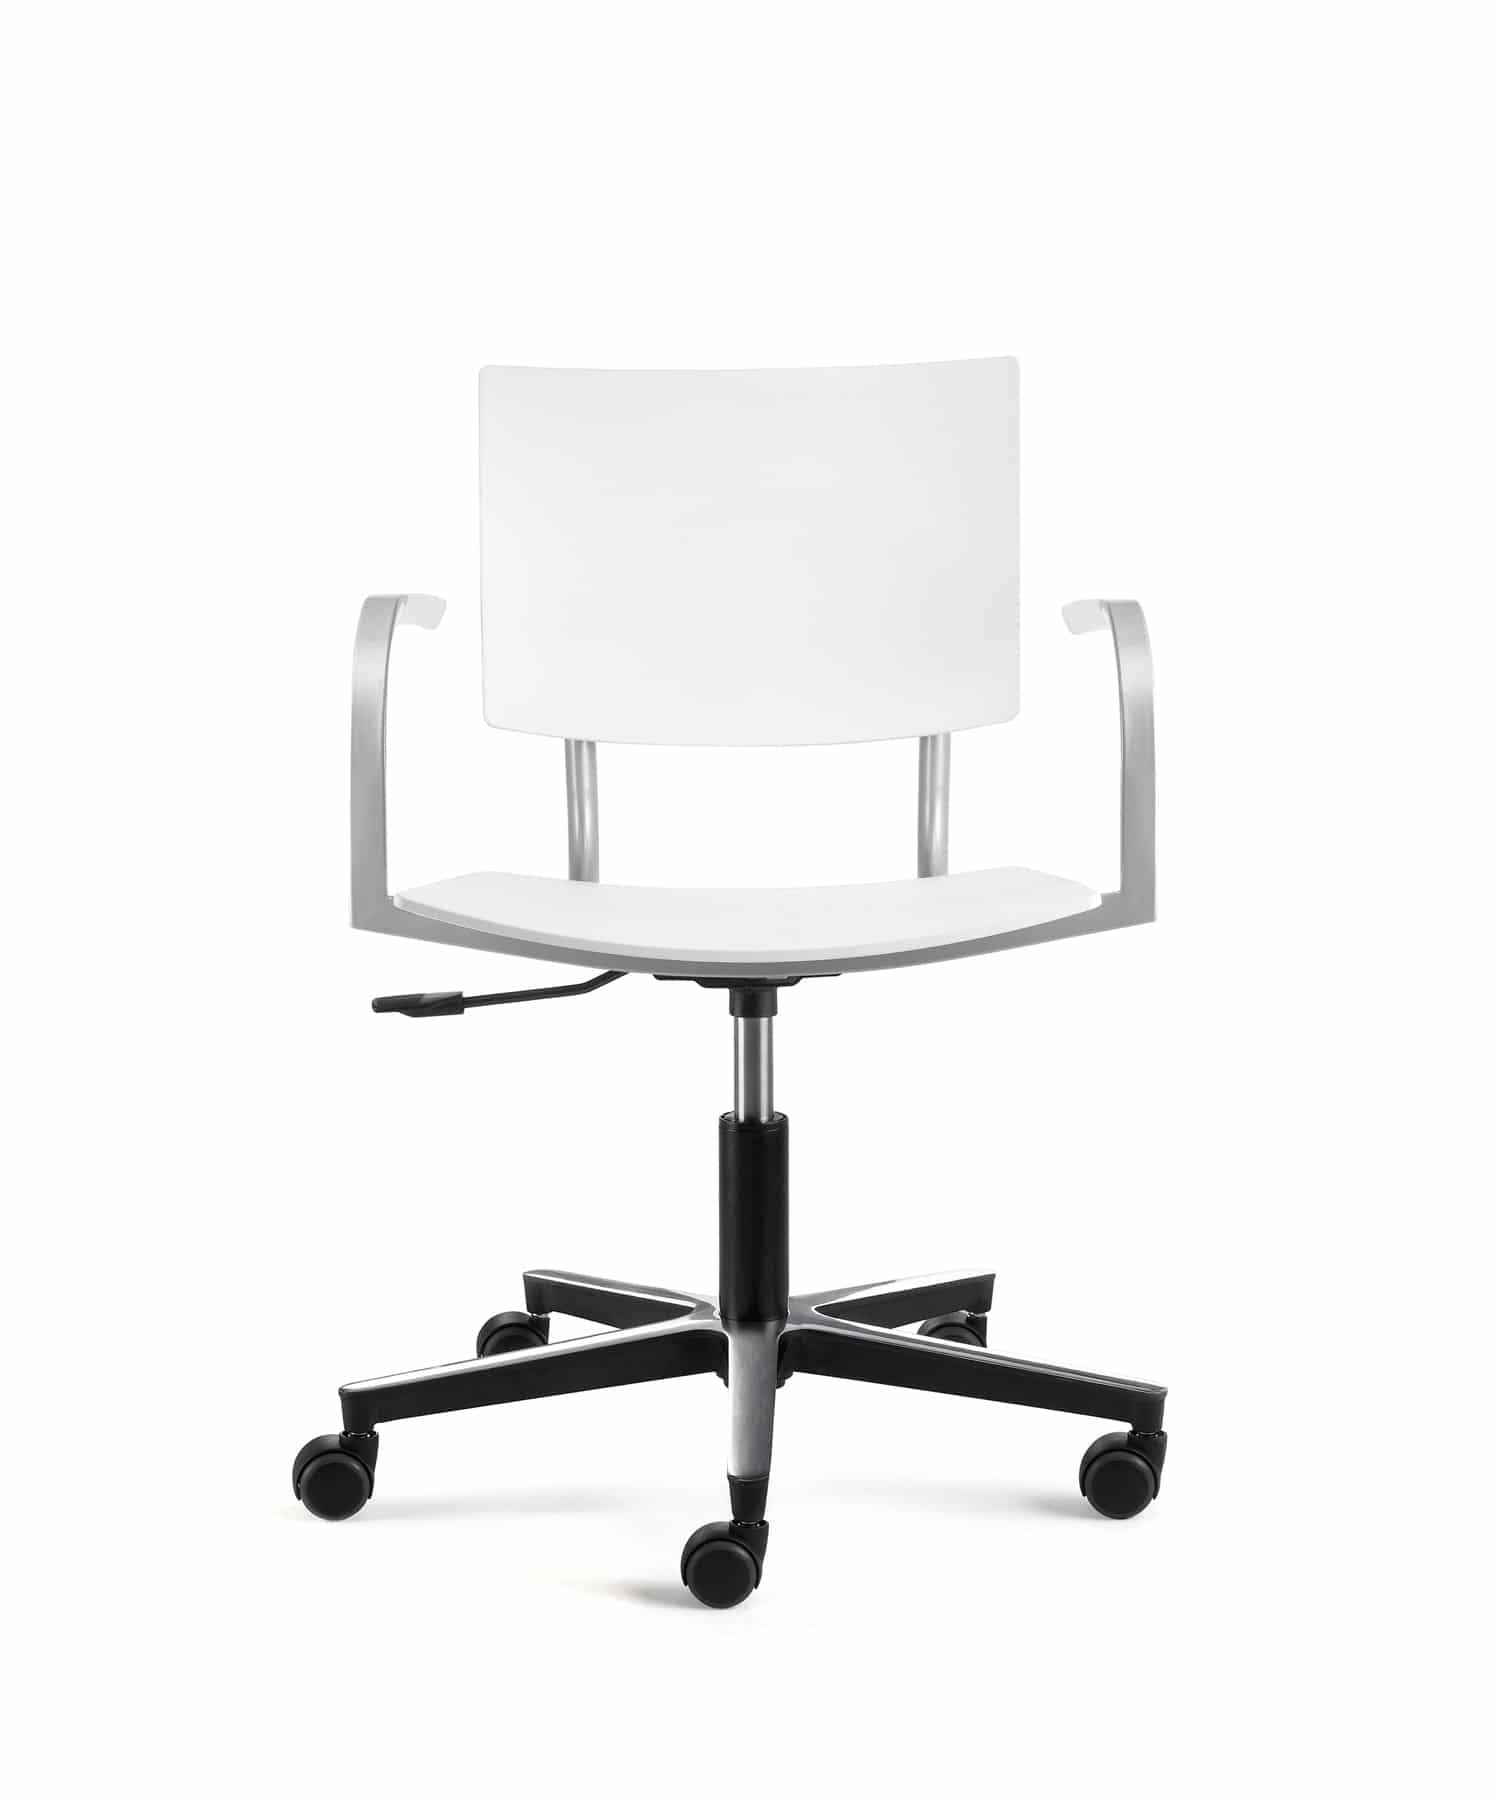 Bio office chair